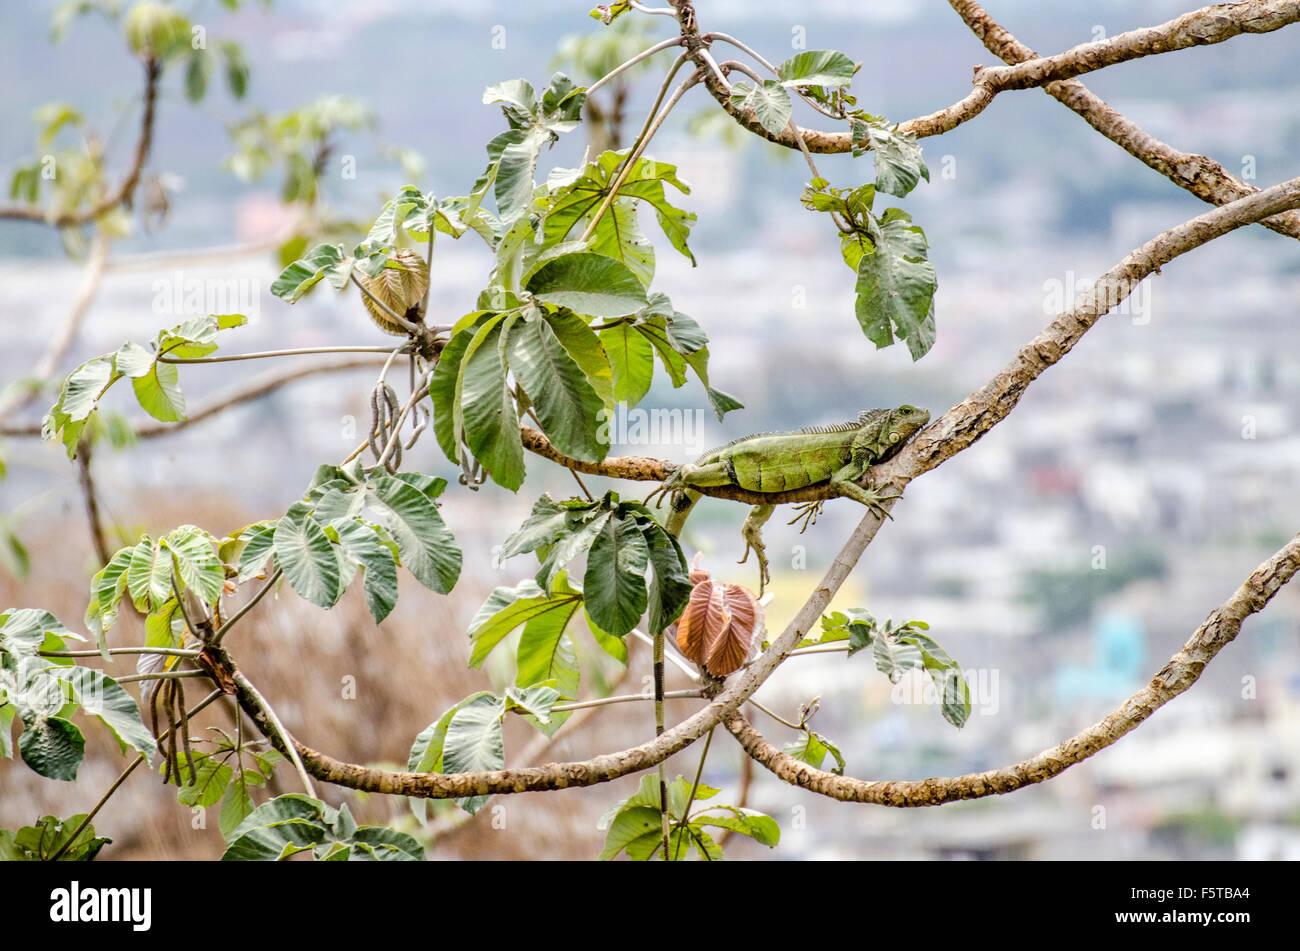 Un iguane vert (Iguana iguana) Banque D'Images